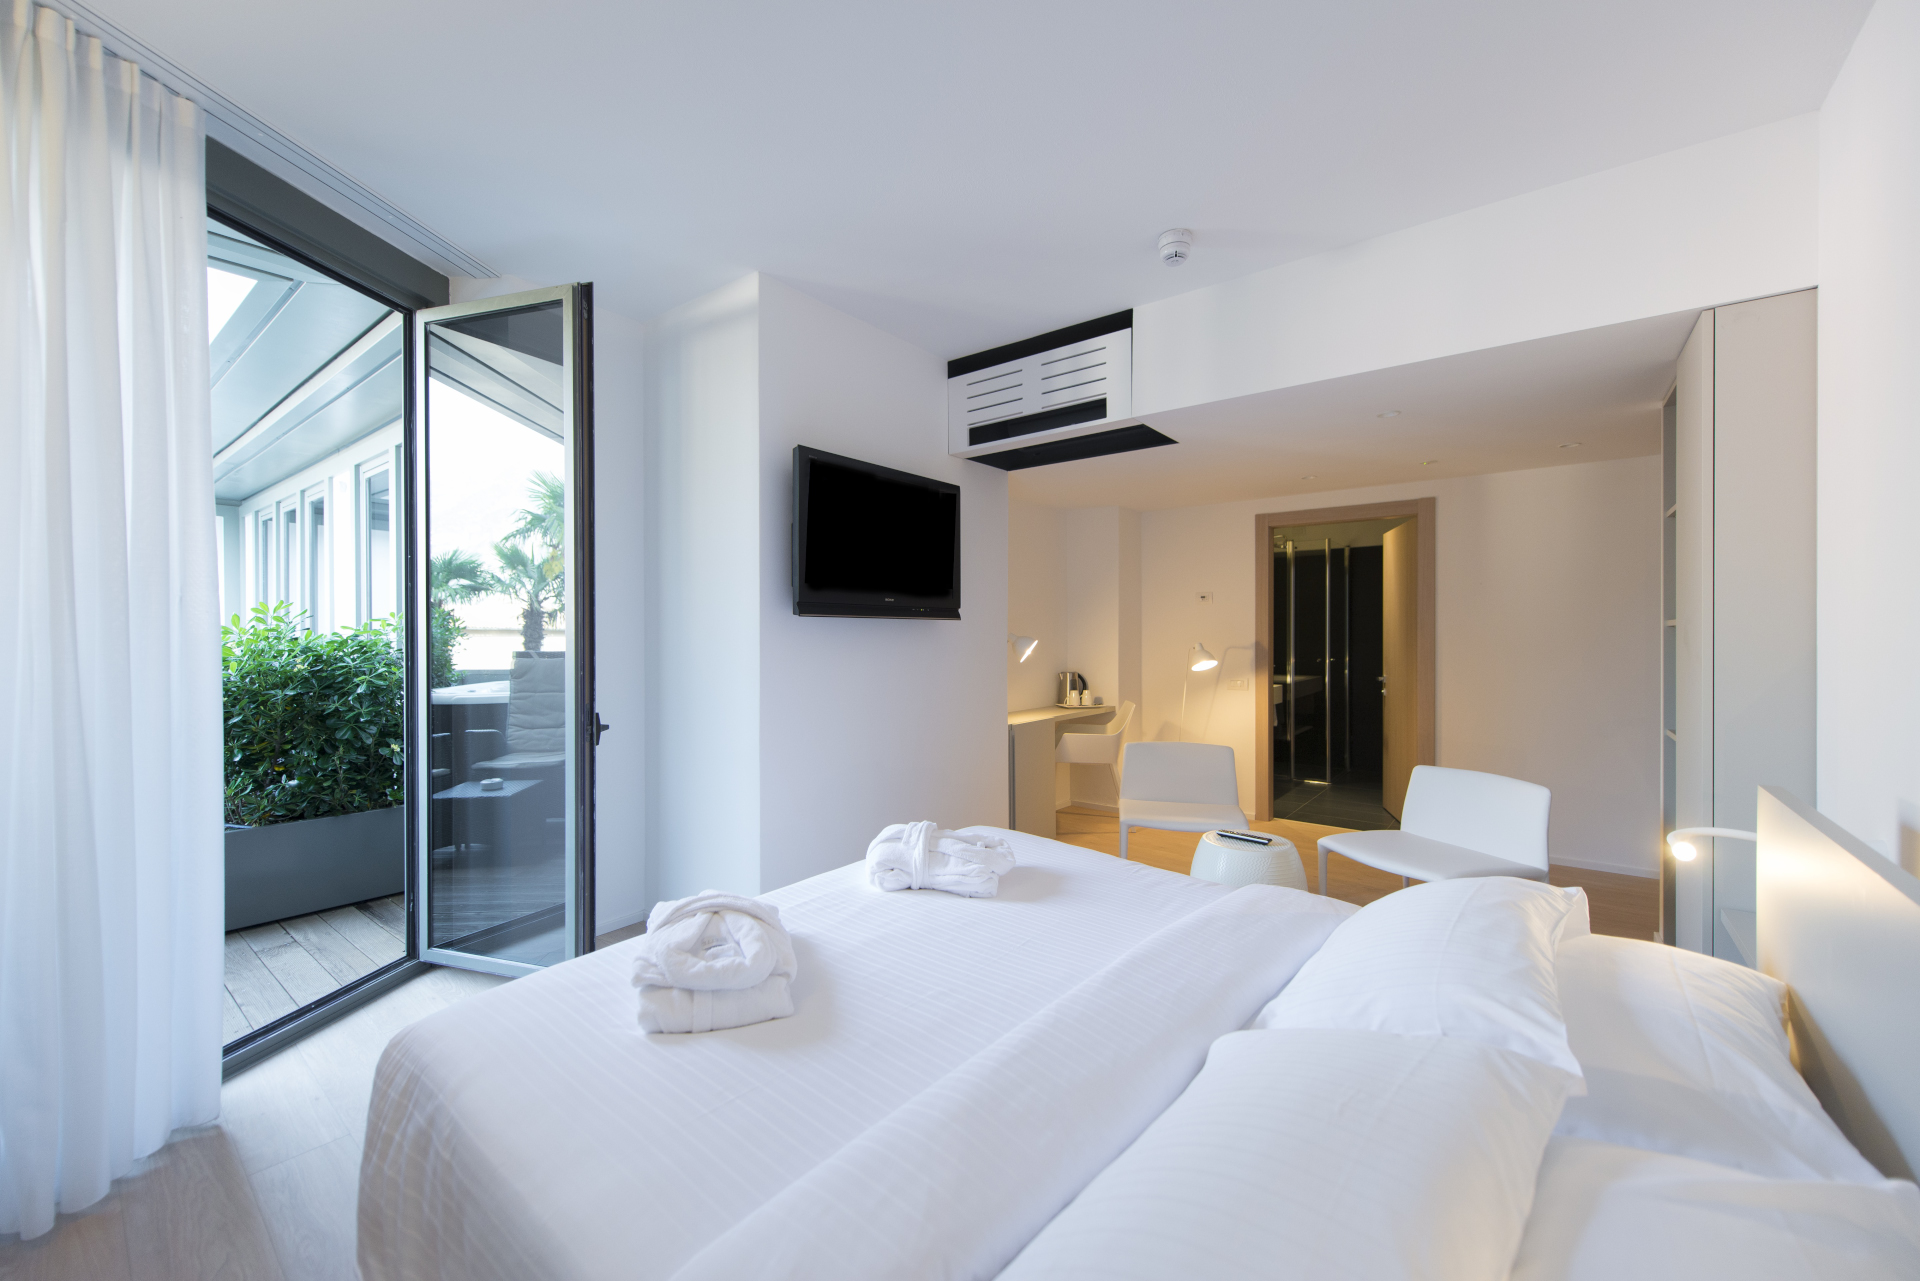 Rooms - Hotel lago di Garda (3)